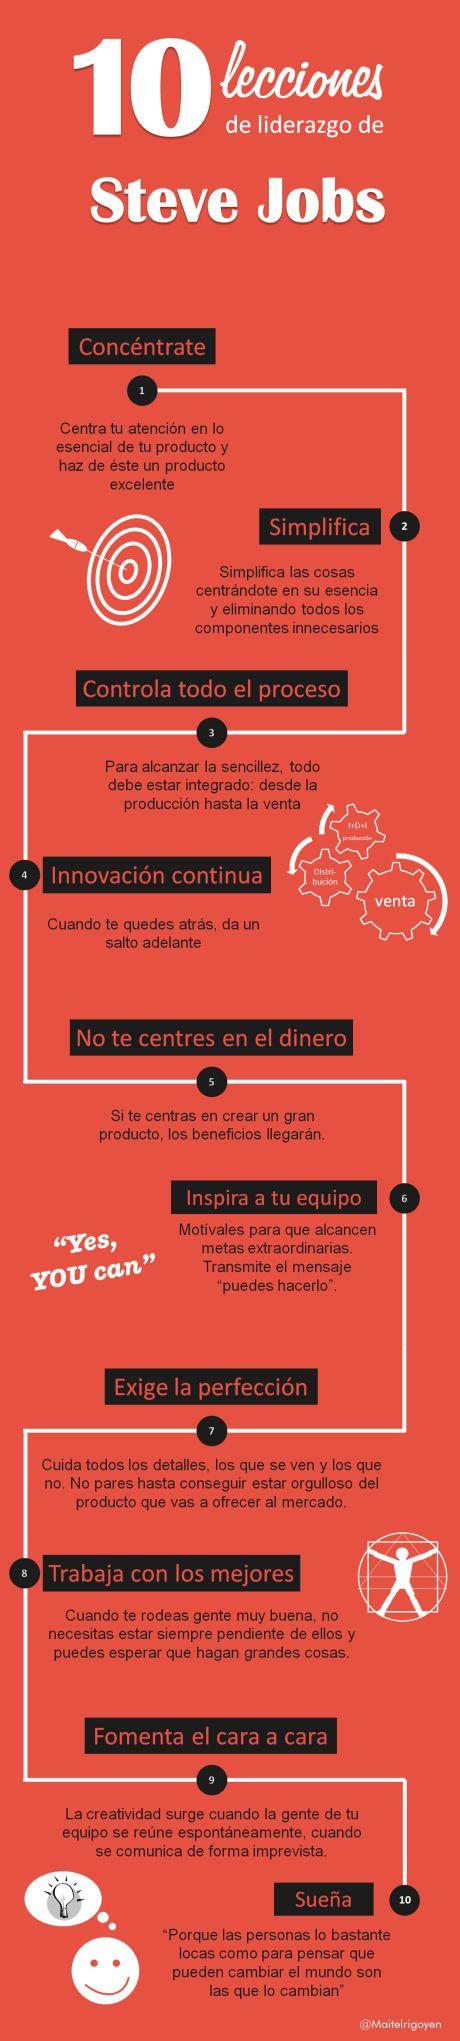 Infografía 10 lecciones de liderazgo de Steve Jobs